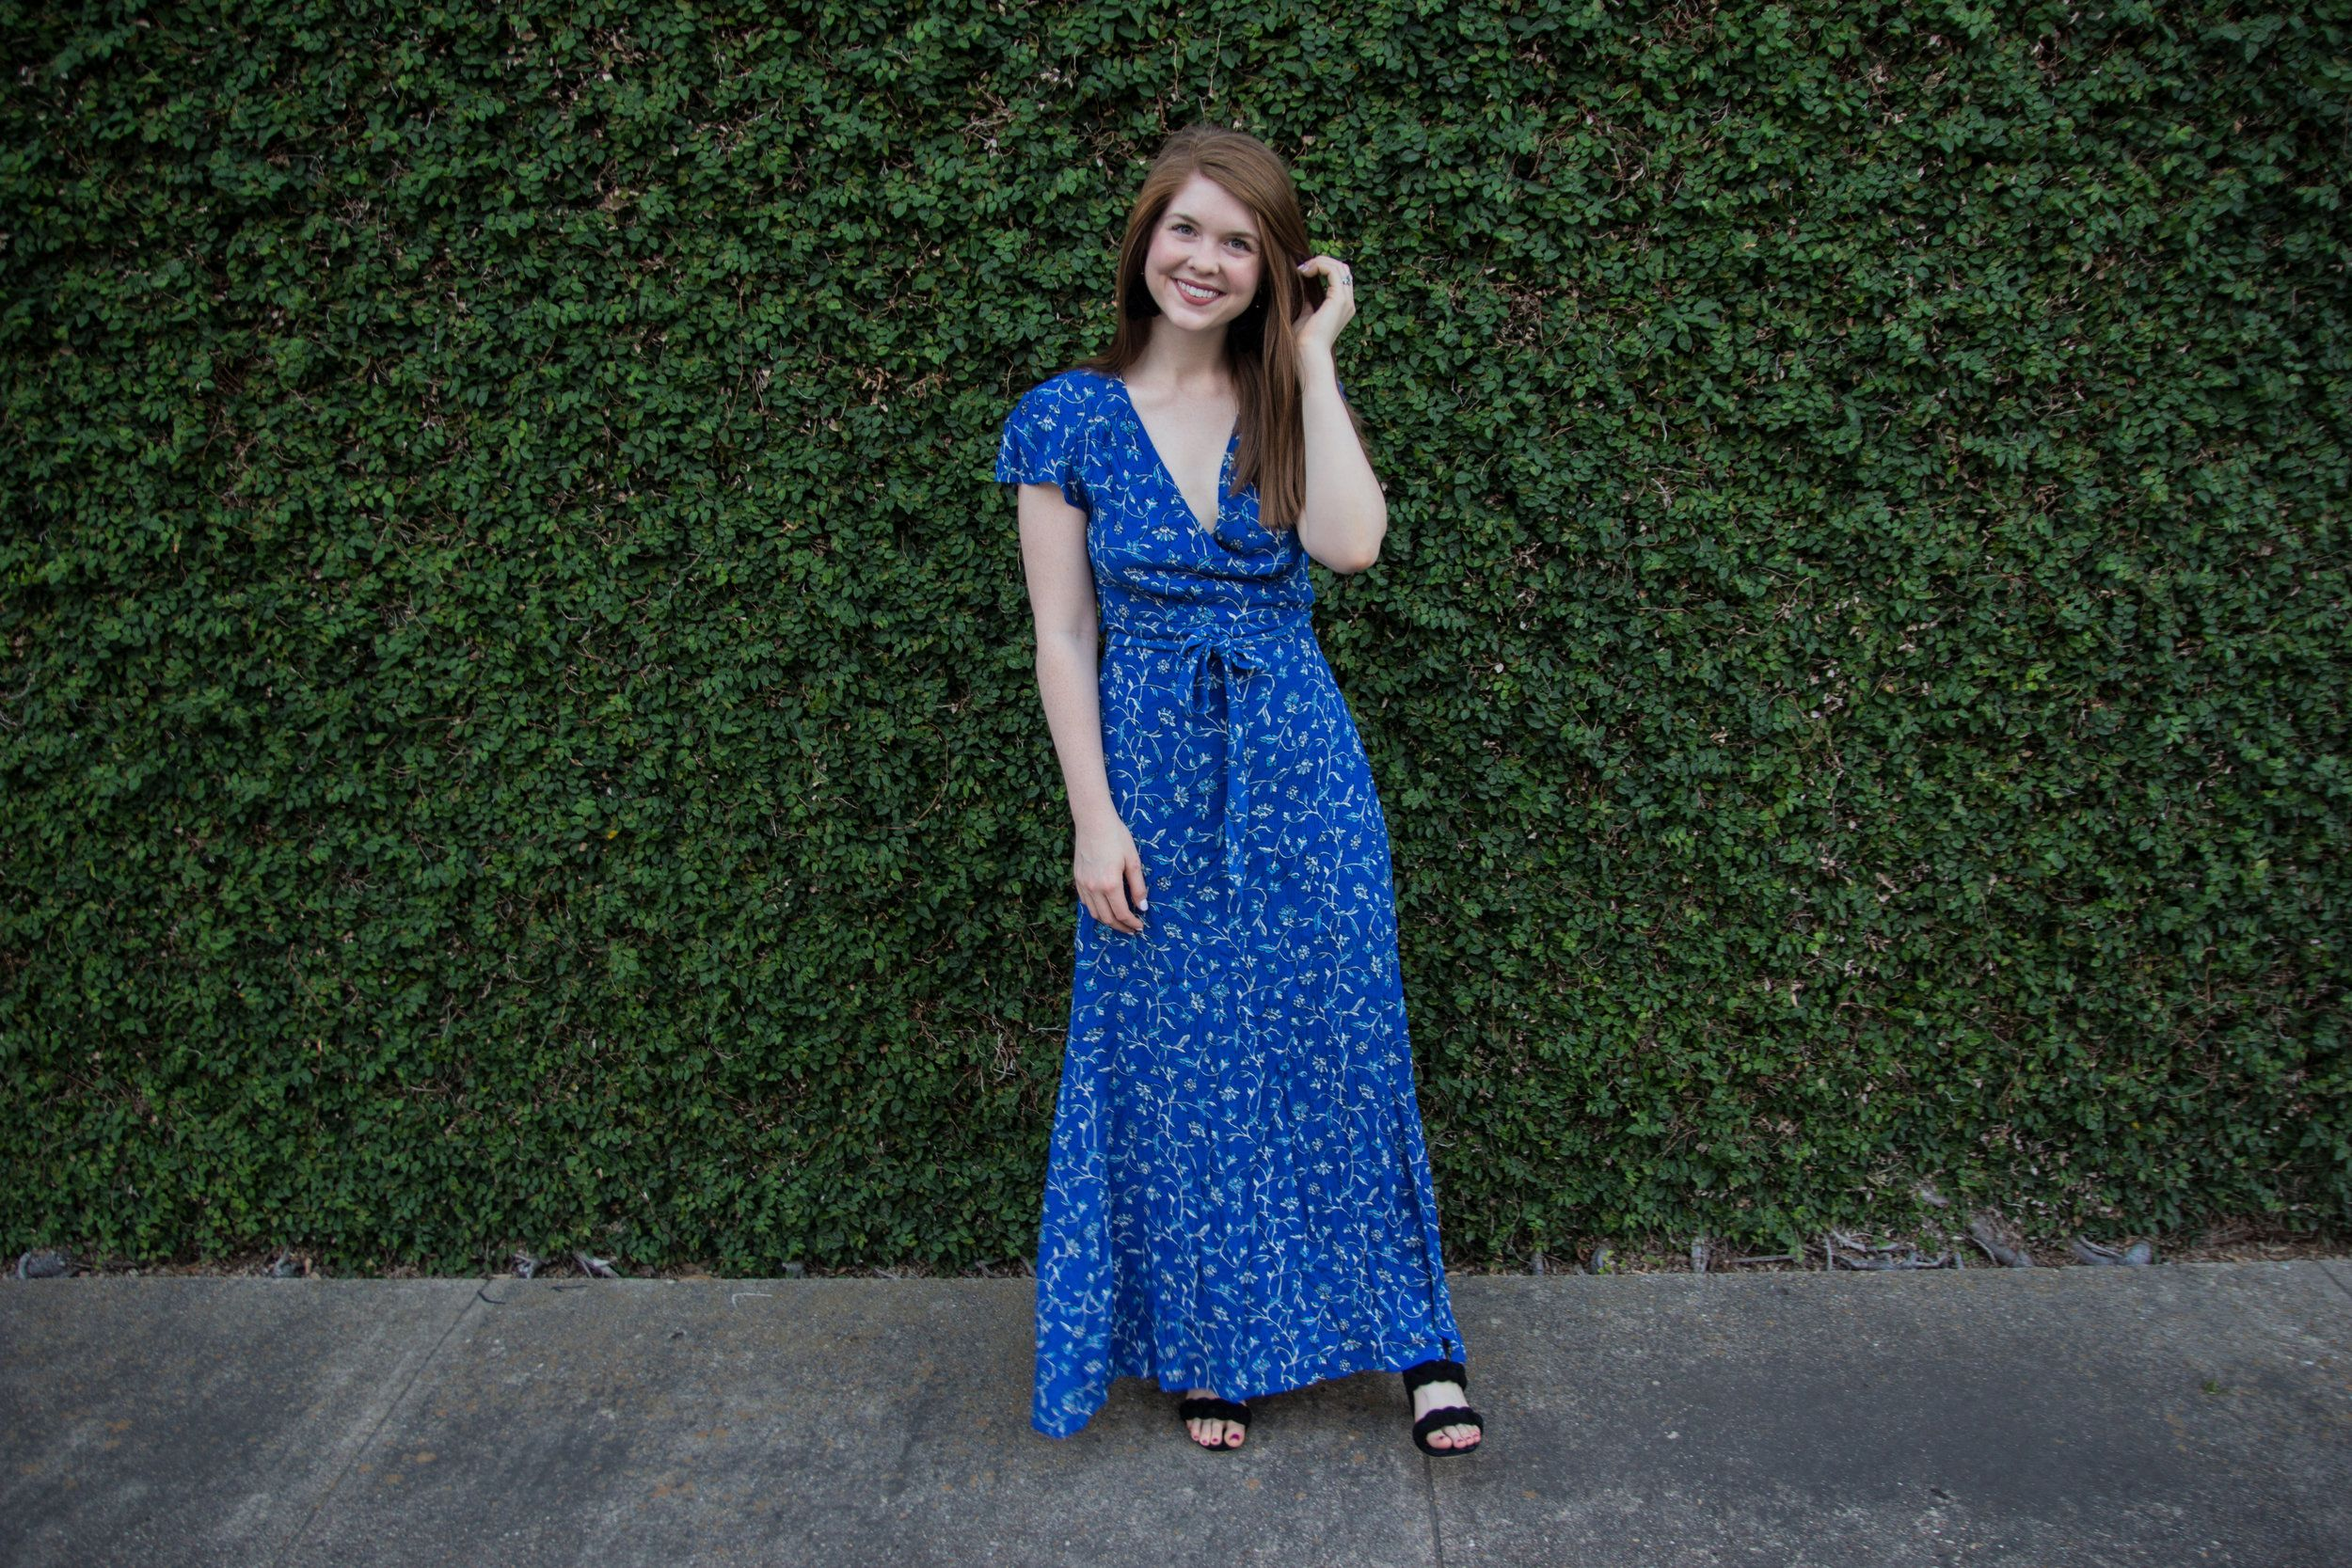 aa65a57cc4 amuse society summer safari dress in blue coast